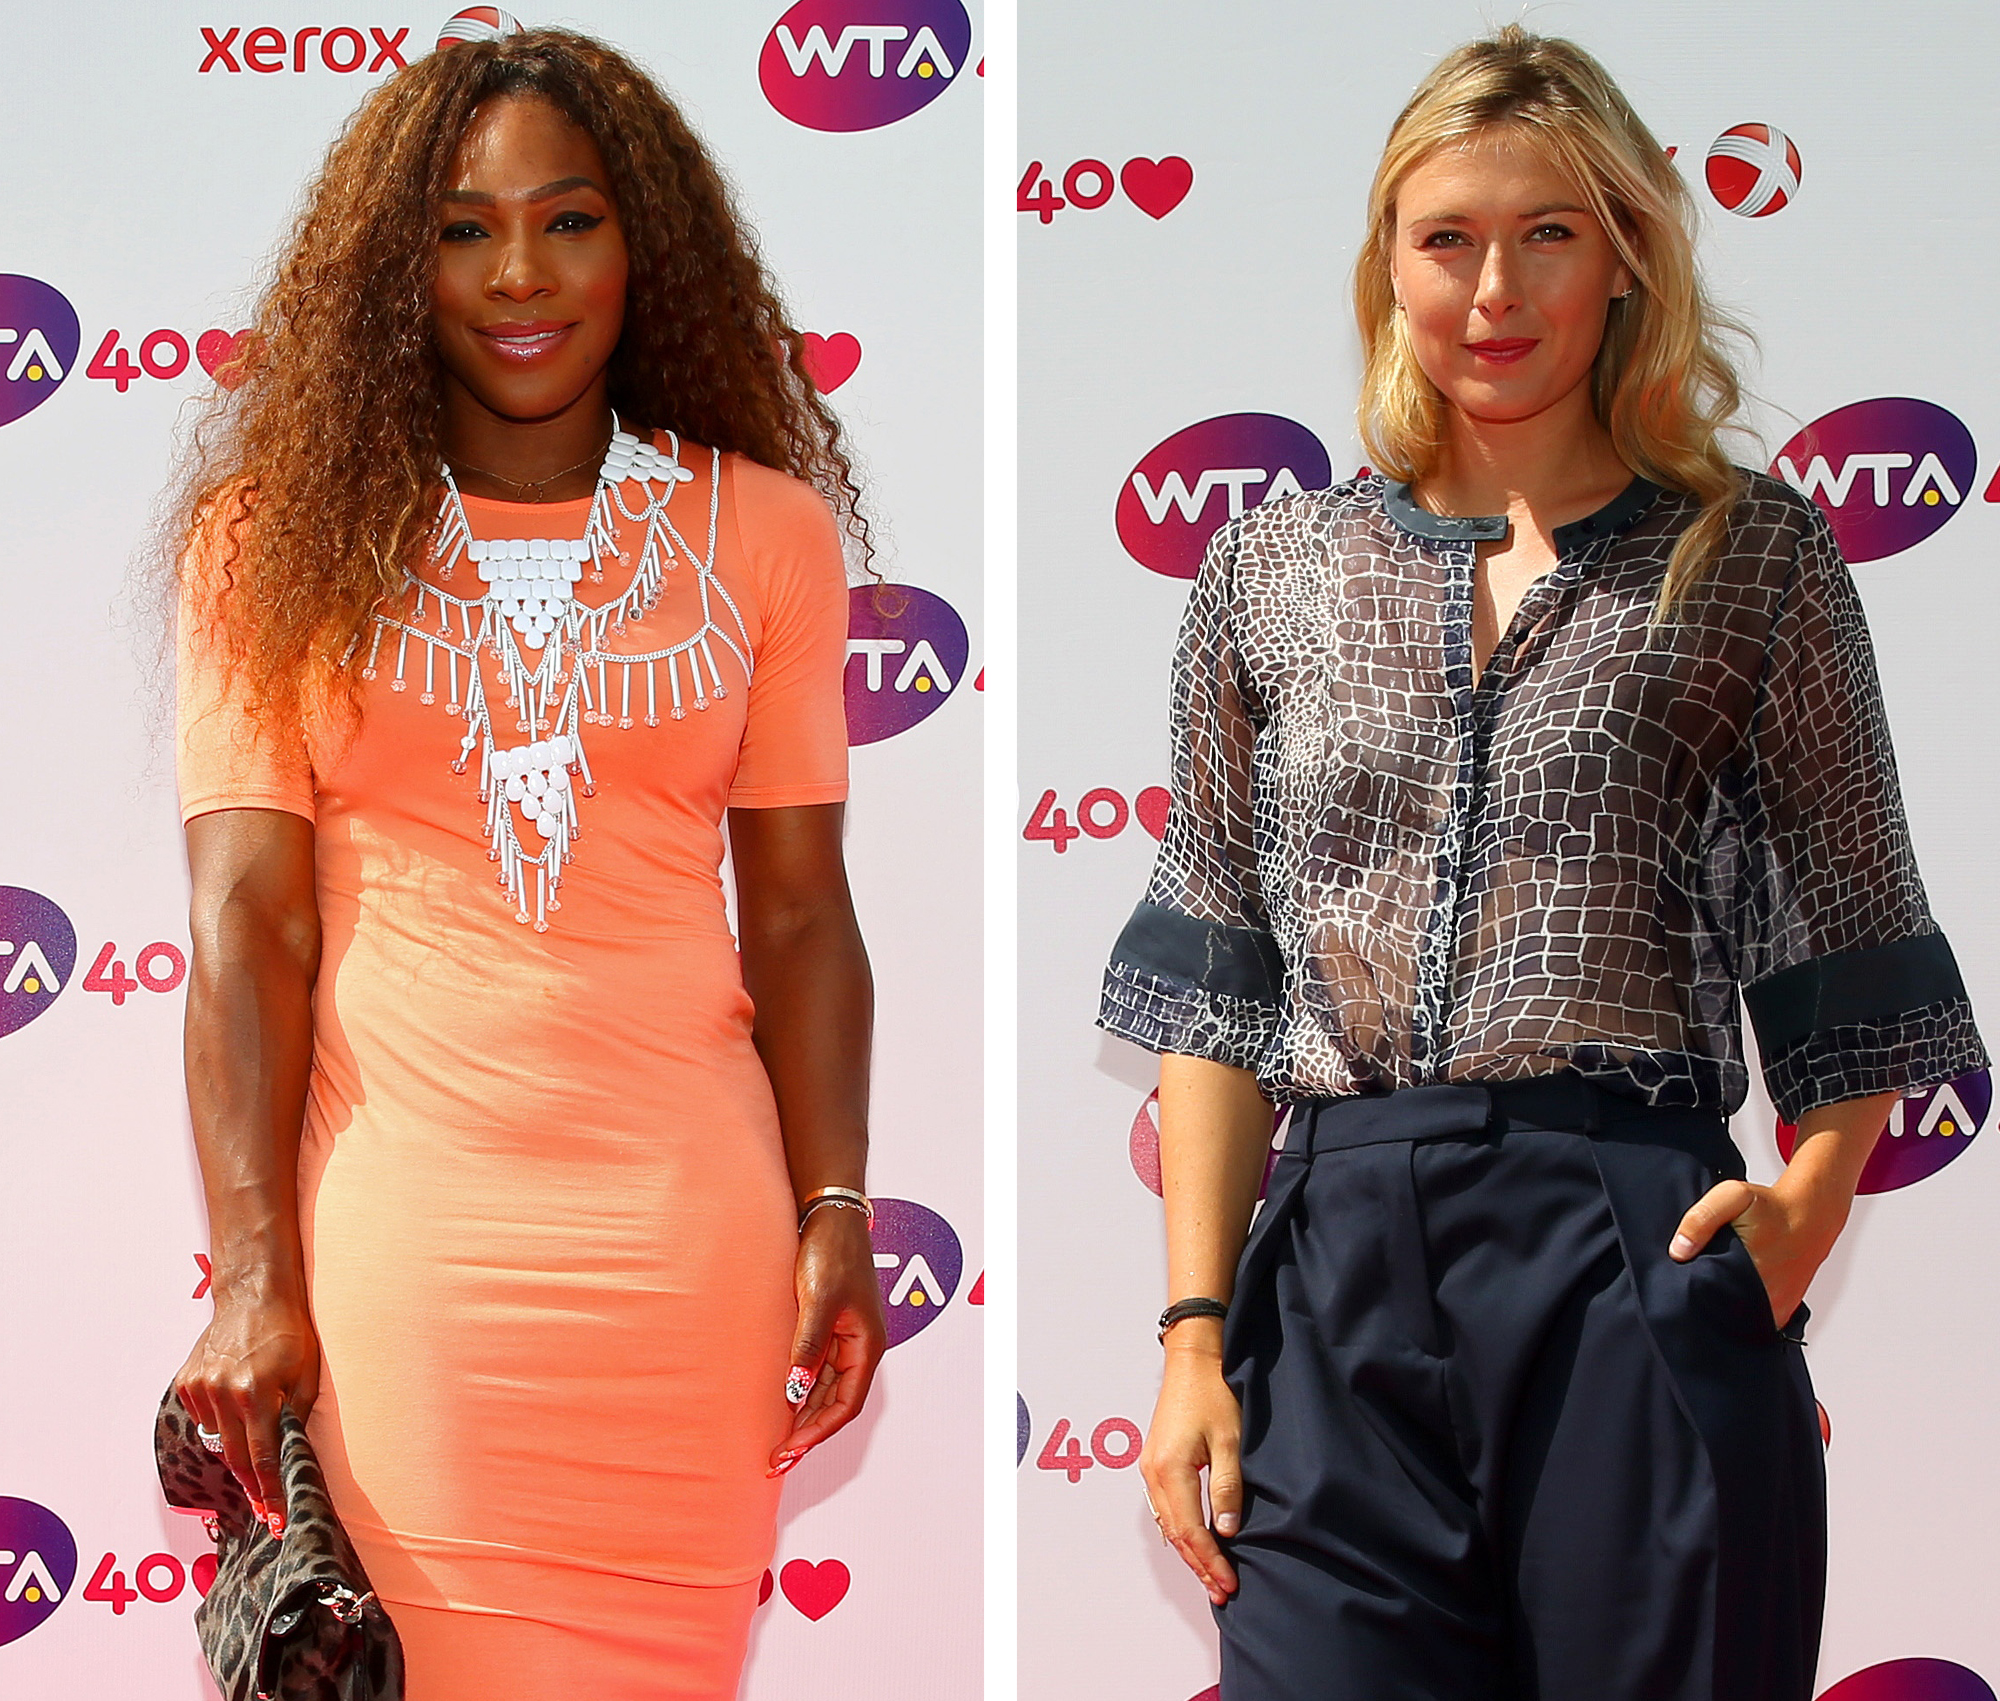 Gallery: Women's Tennis Association celebrates 40 years